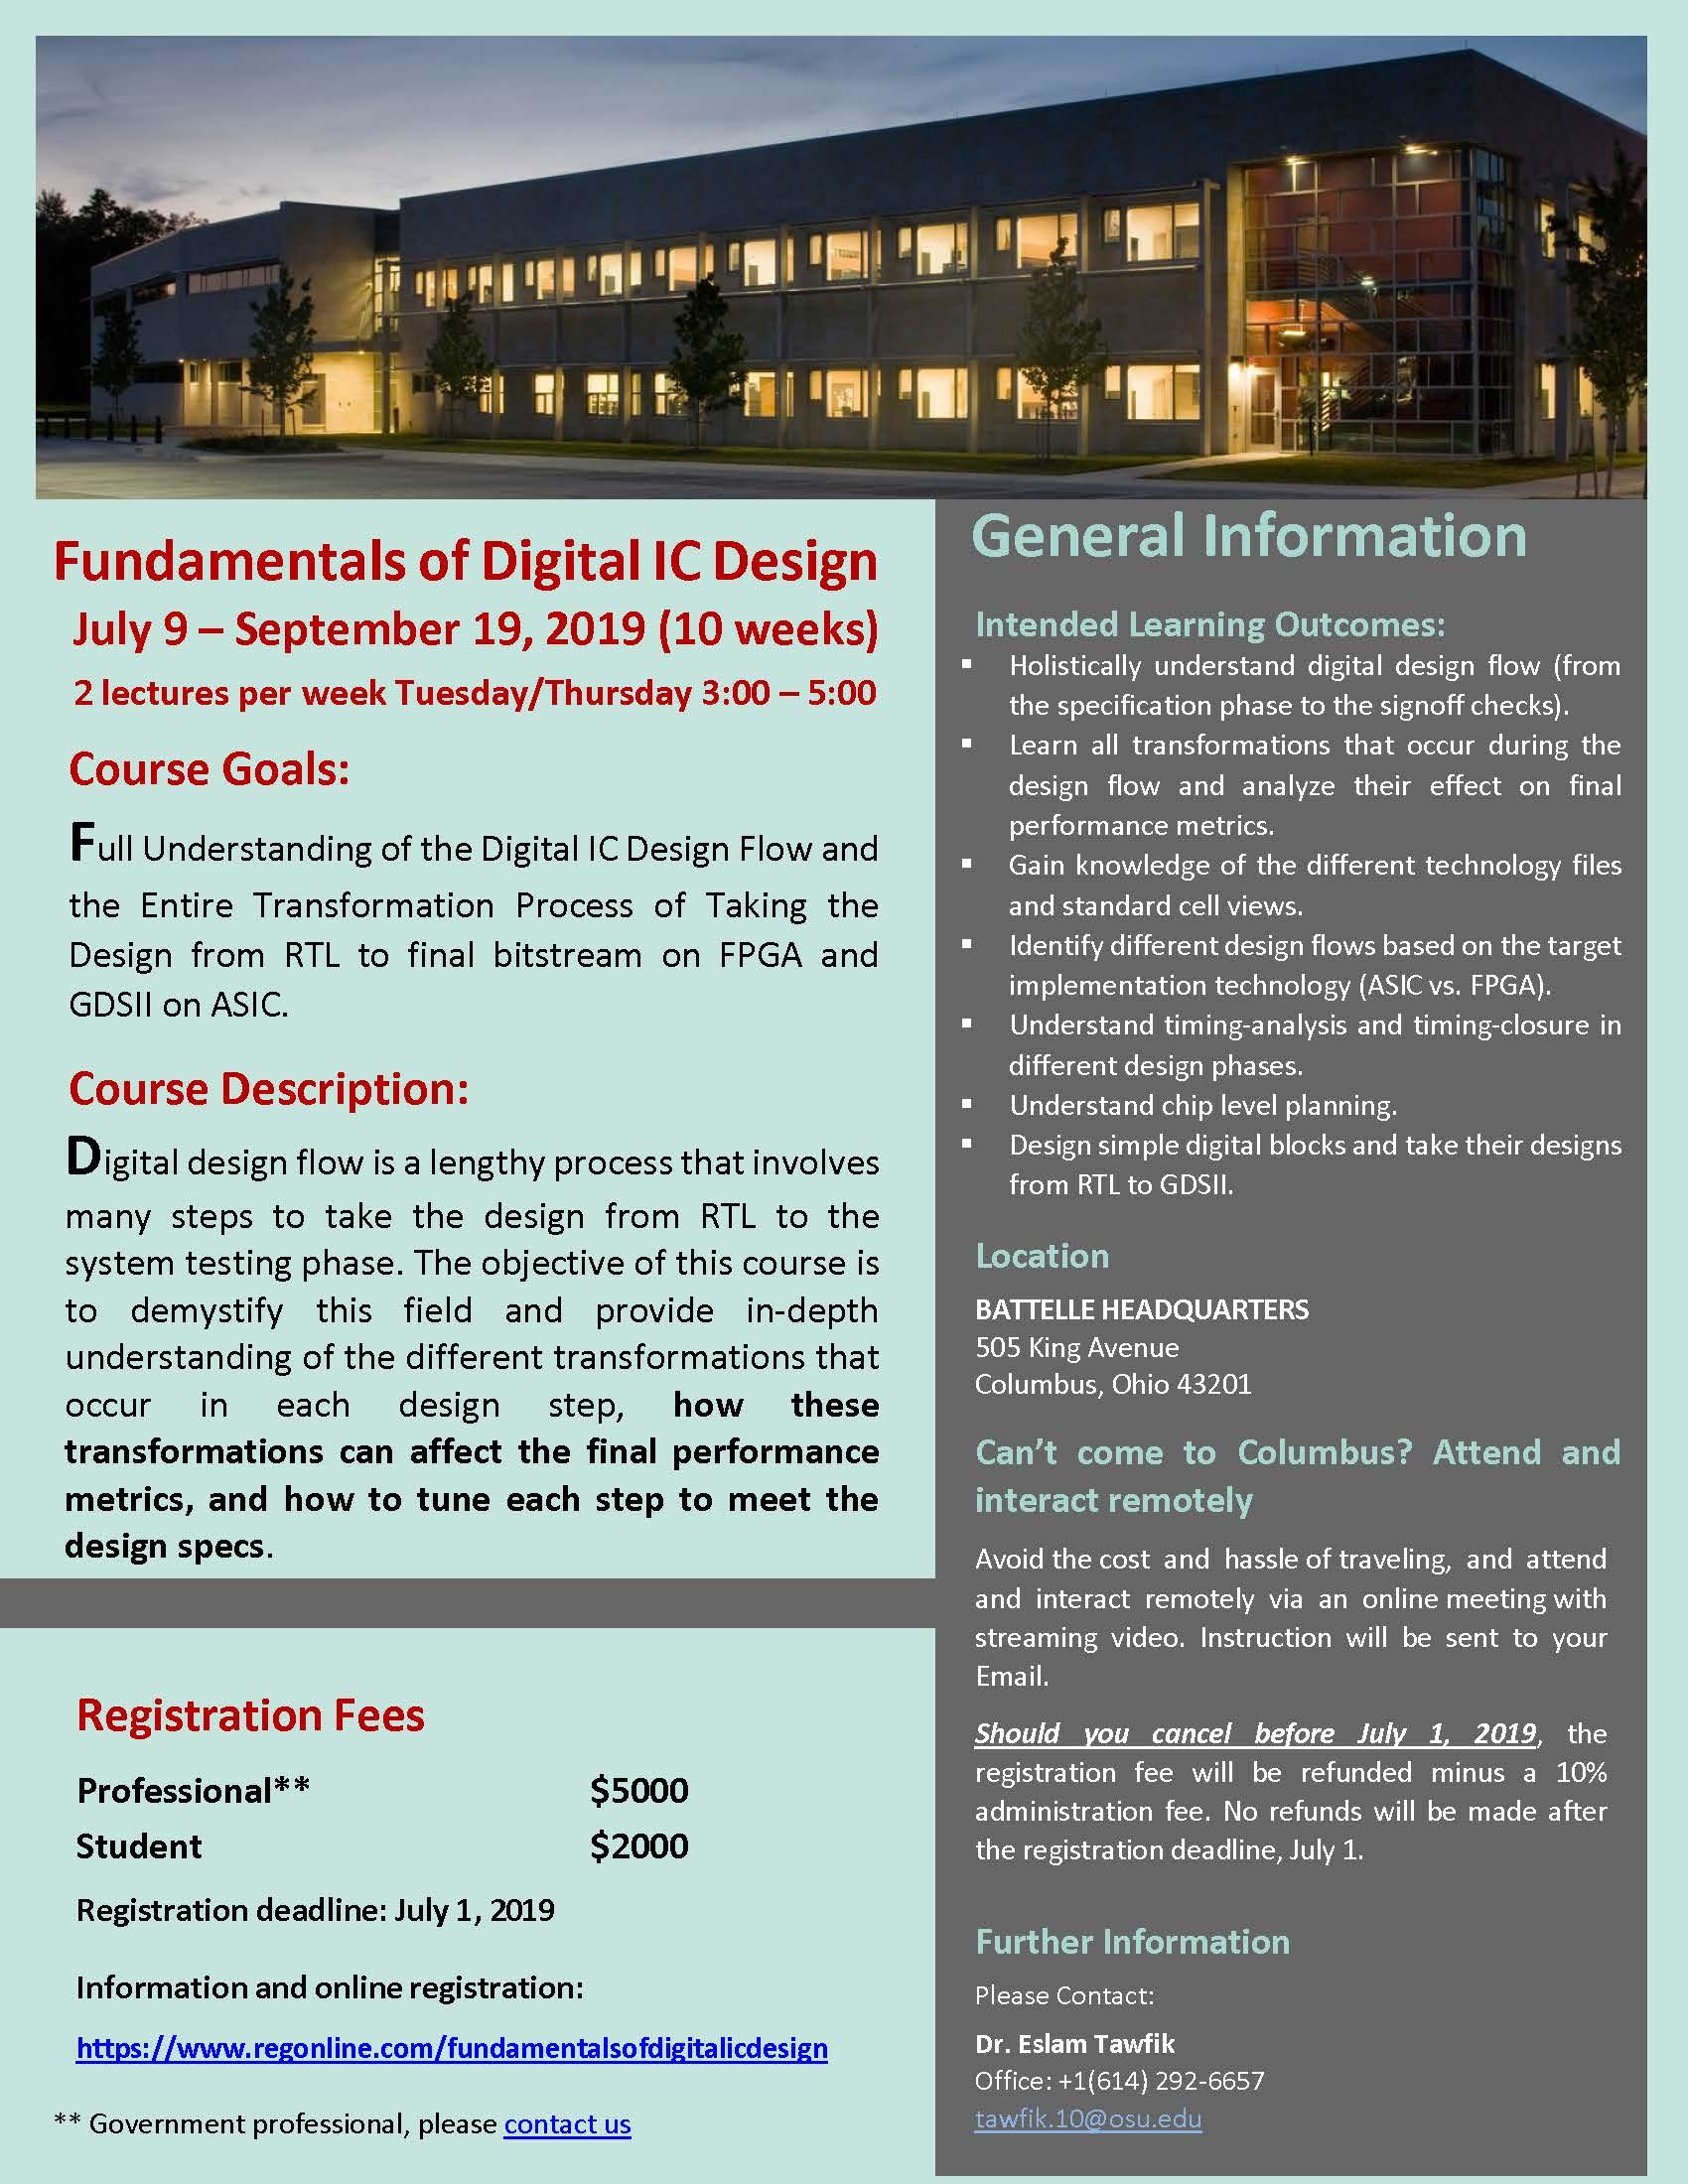 Fundamentals of Digital IC Design - New Course